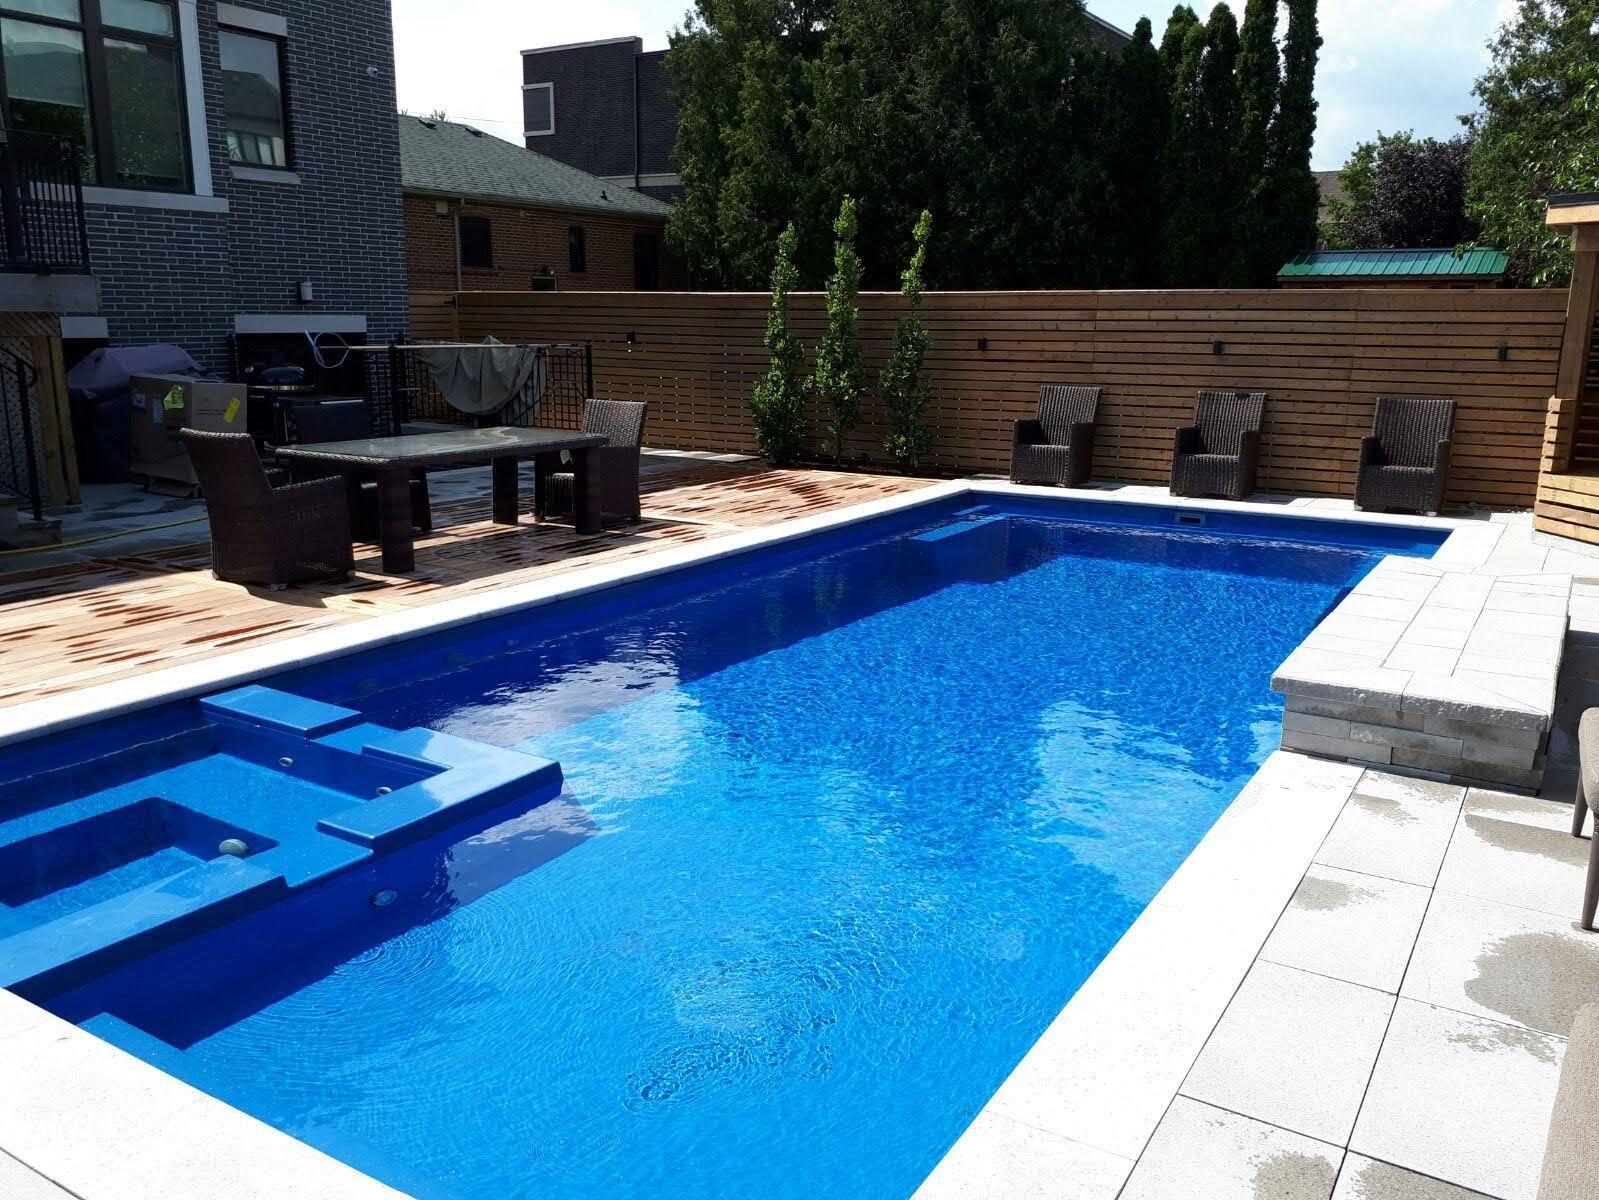 Leisure Pools of Toronto | Fiberglass swimming pool ...